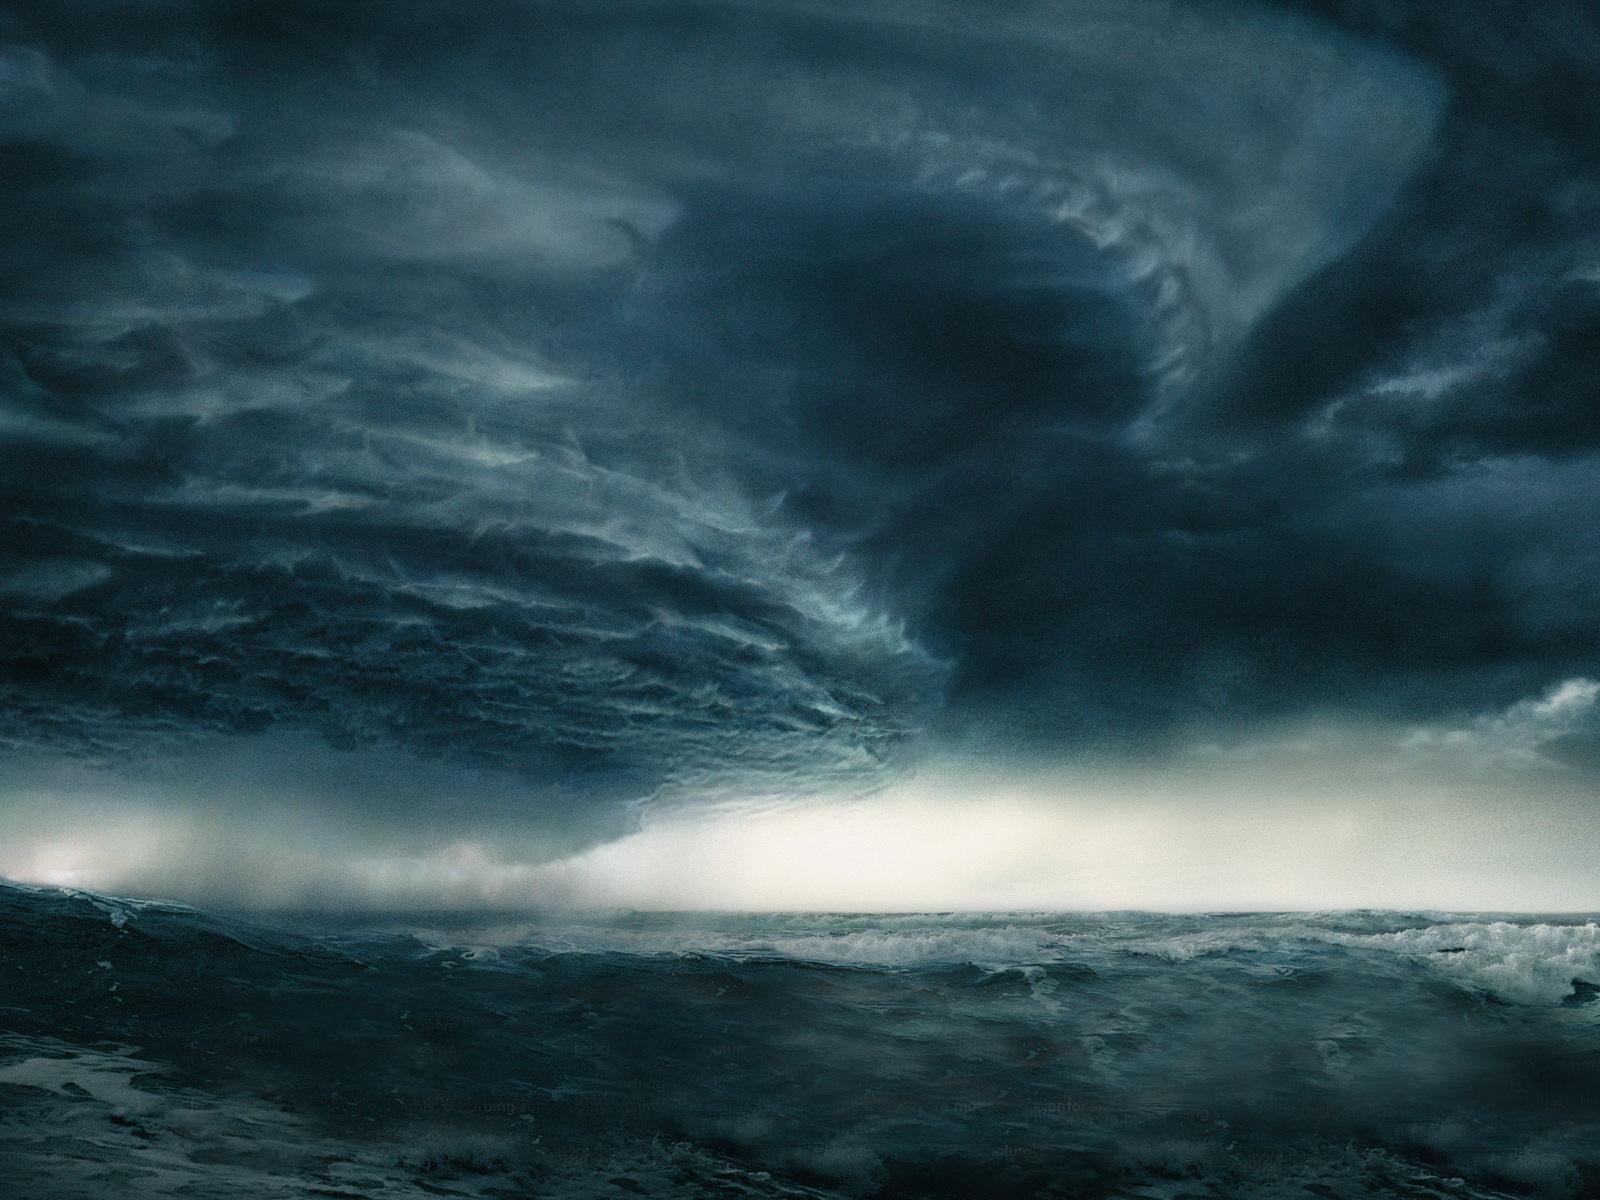 tormenta-force-of-nature-ocean-storm-wallpaper